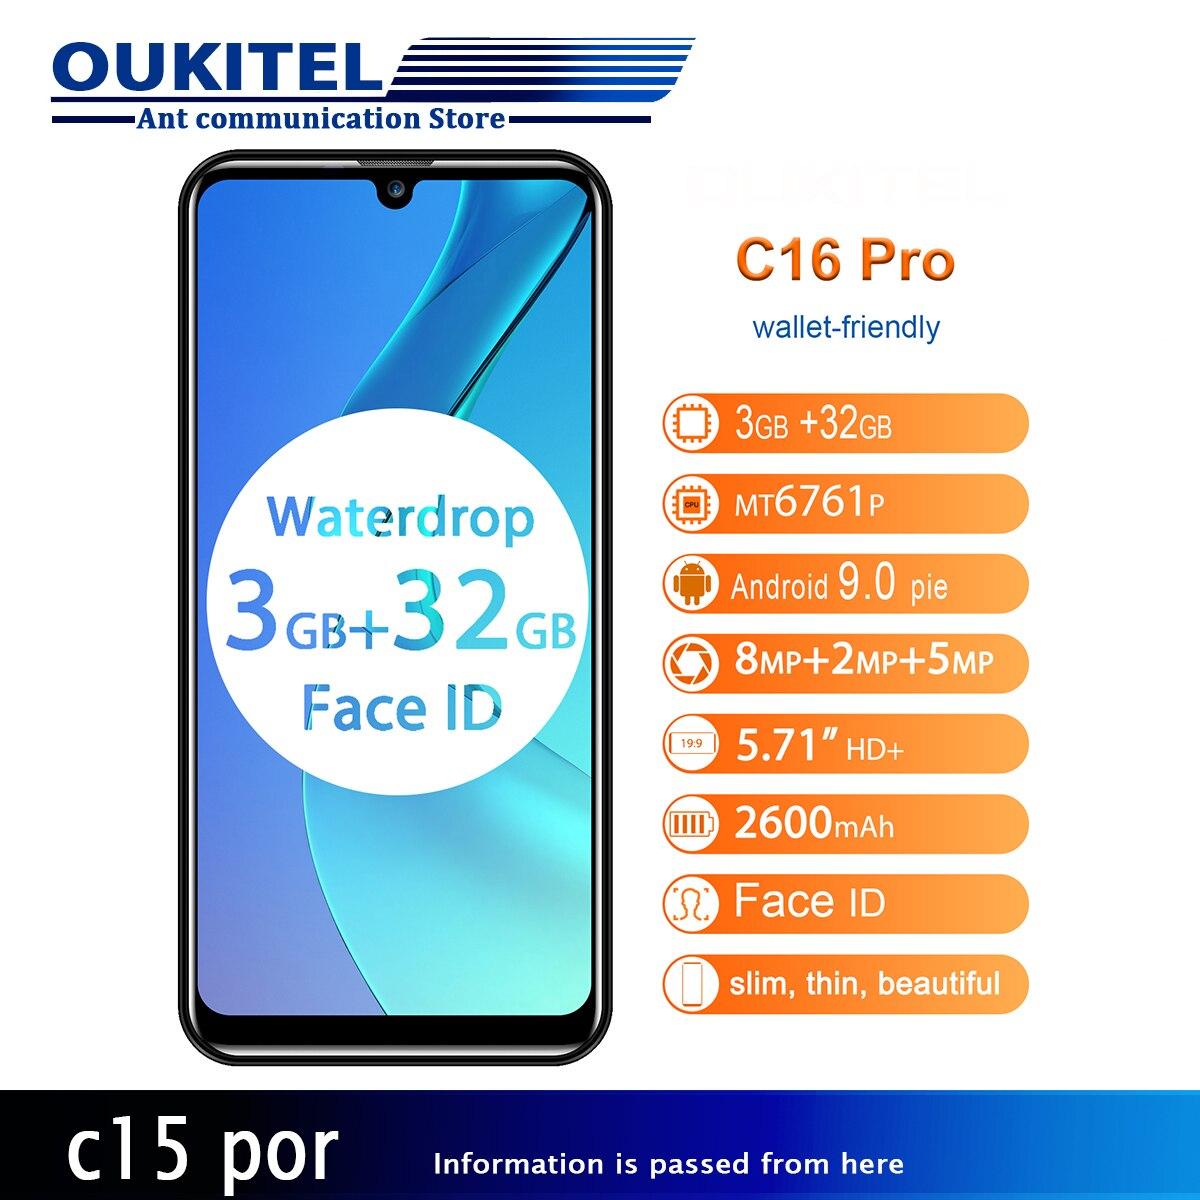 OUKITEL C16 Pro 3 ГБ 32 ГБ смартфон отпечаток пальца Лицо ID Водонепроницаемая капля экран 5 В/1A 4G мобильный телефон 5,71 ''Android 9,0 19:9 MT6761P